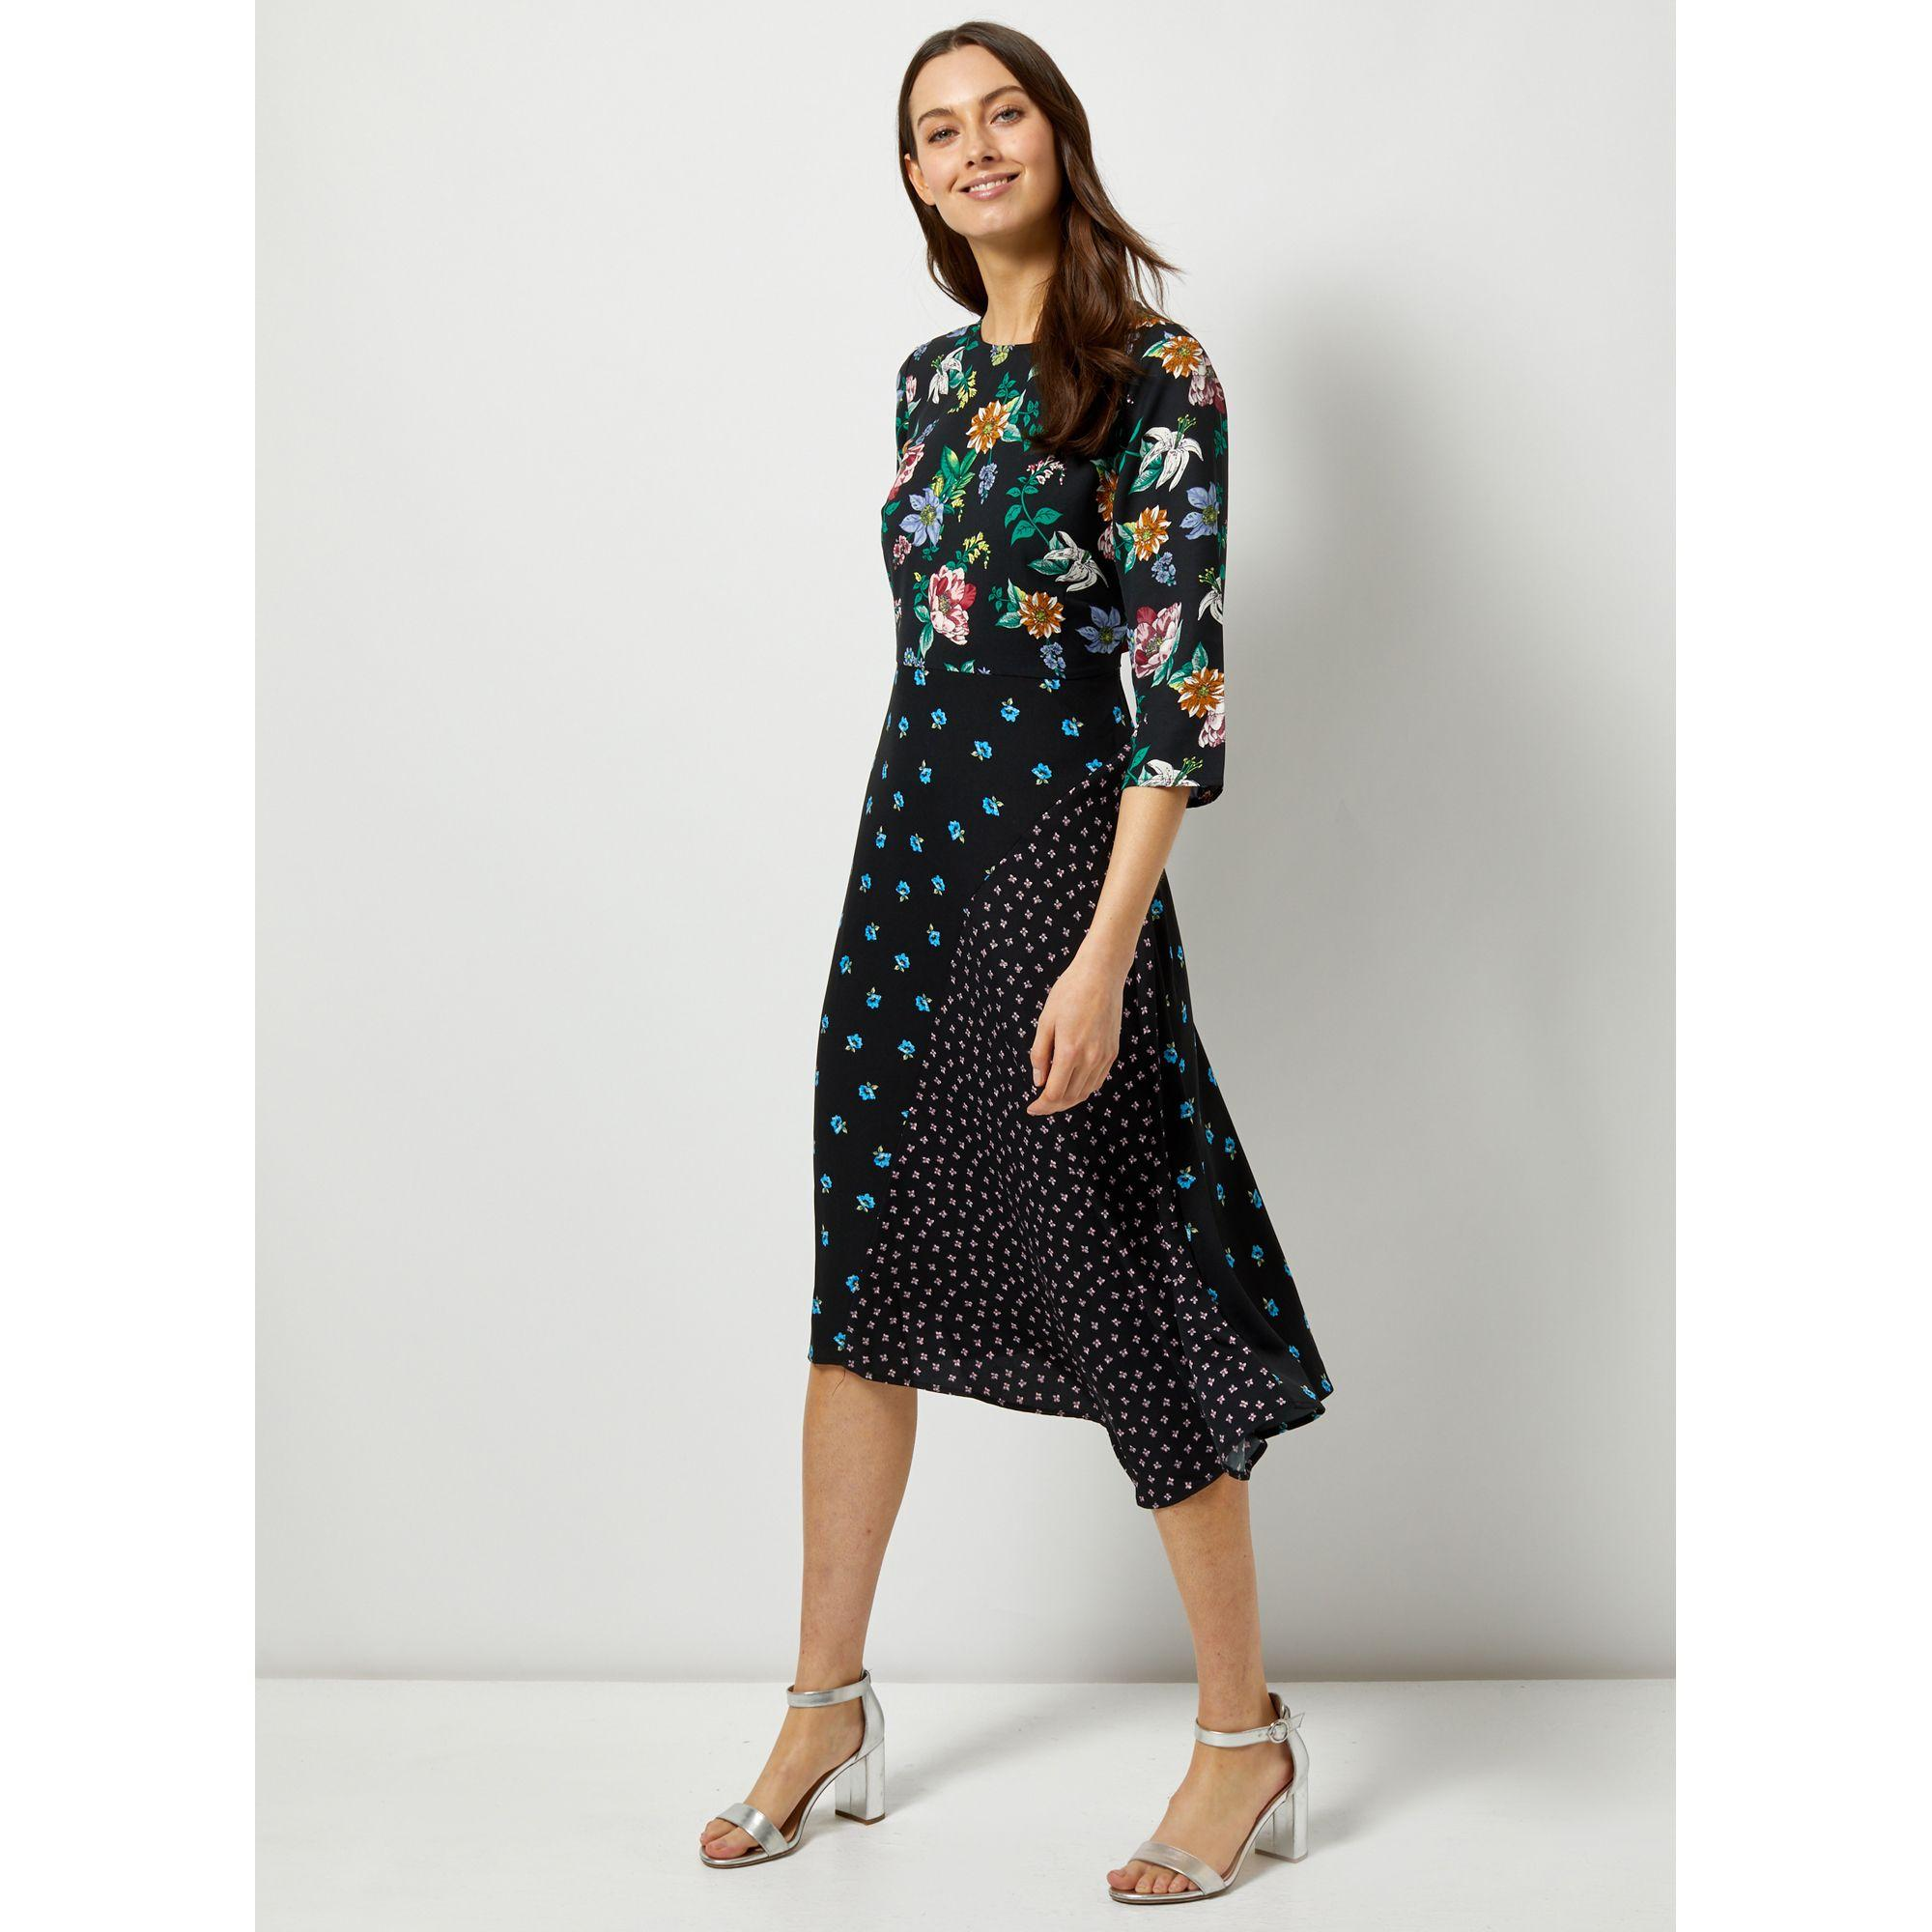 eee9f68250f92c Dorothy Perkins. Women's Multi Colour Ditsy Print Asymmetric Midi Dress